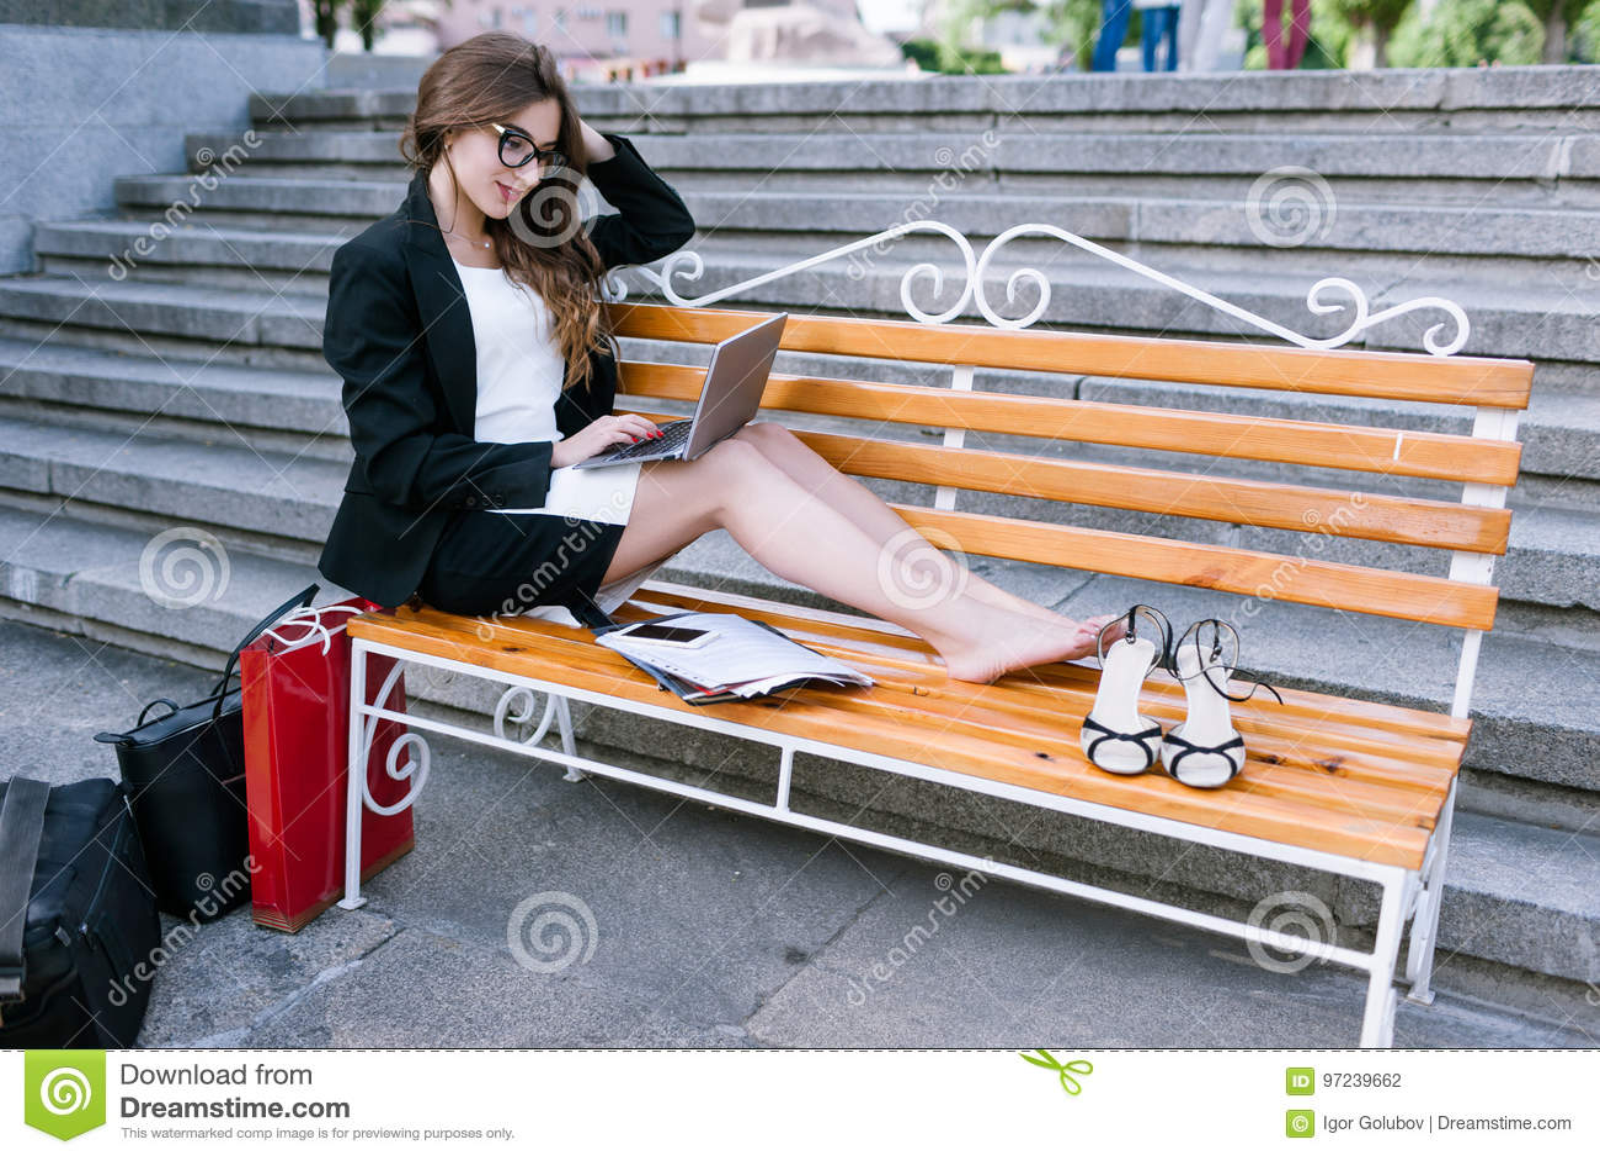 https://thumbs.dreamstime.com/z/overworked-secretary-tired-legs-workaholics-working-process-street-97239662.jpg